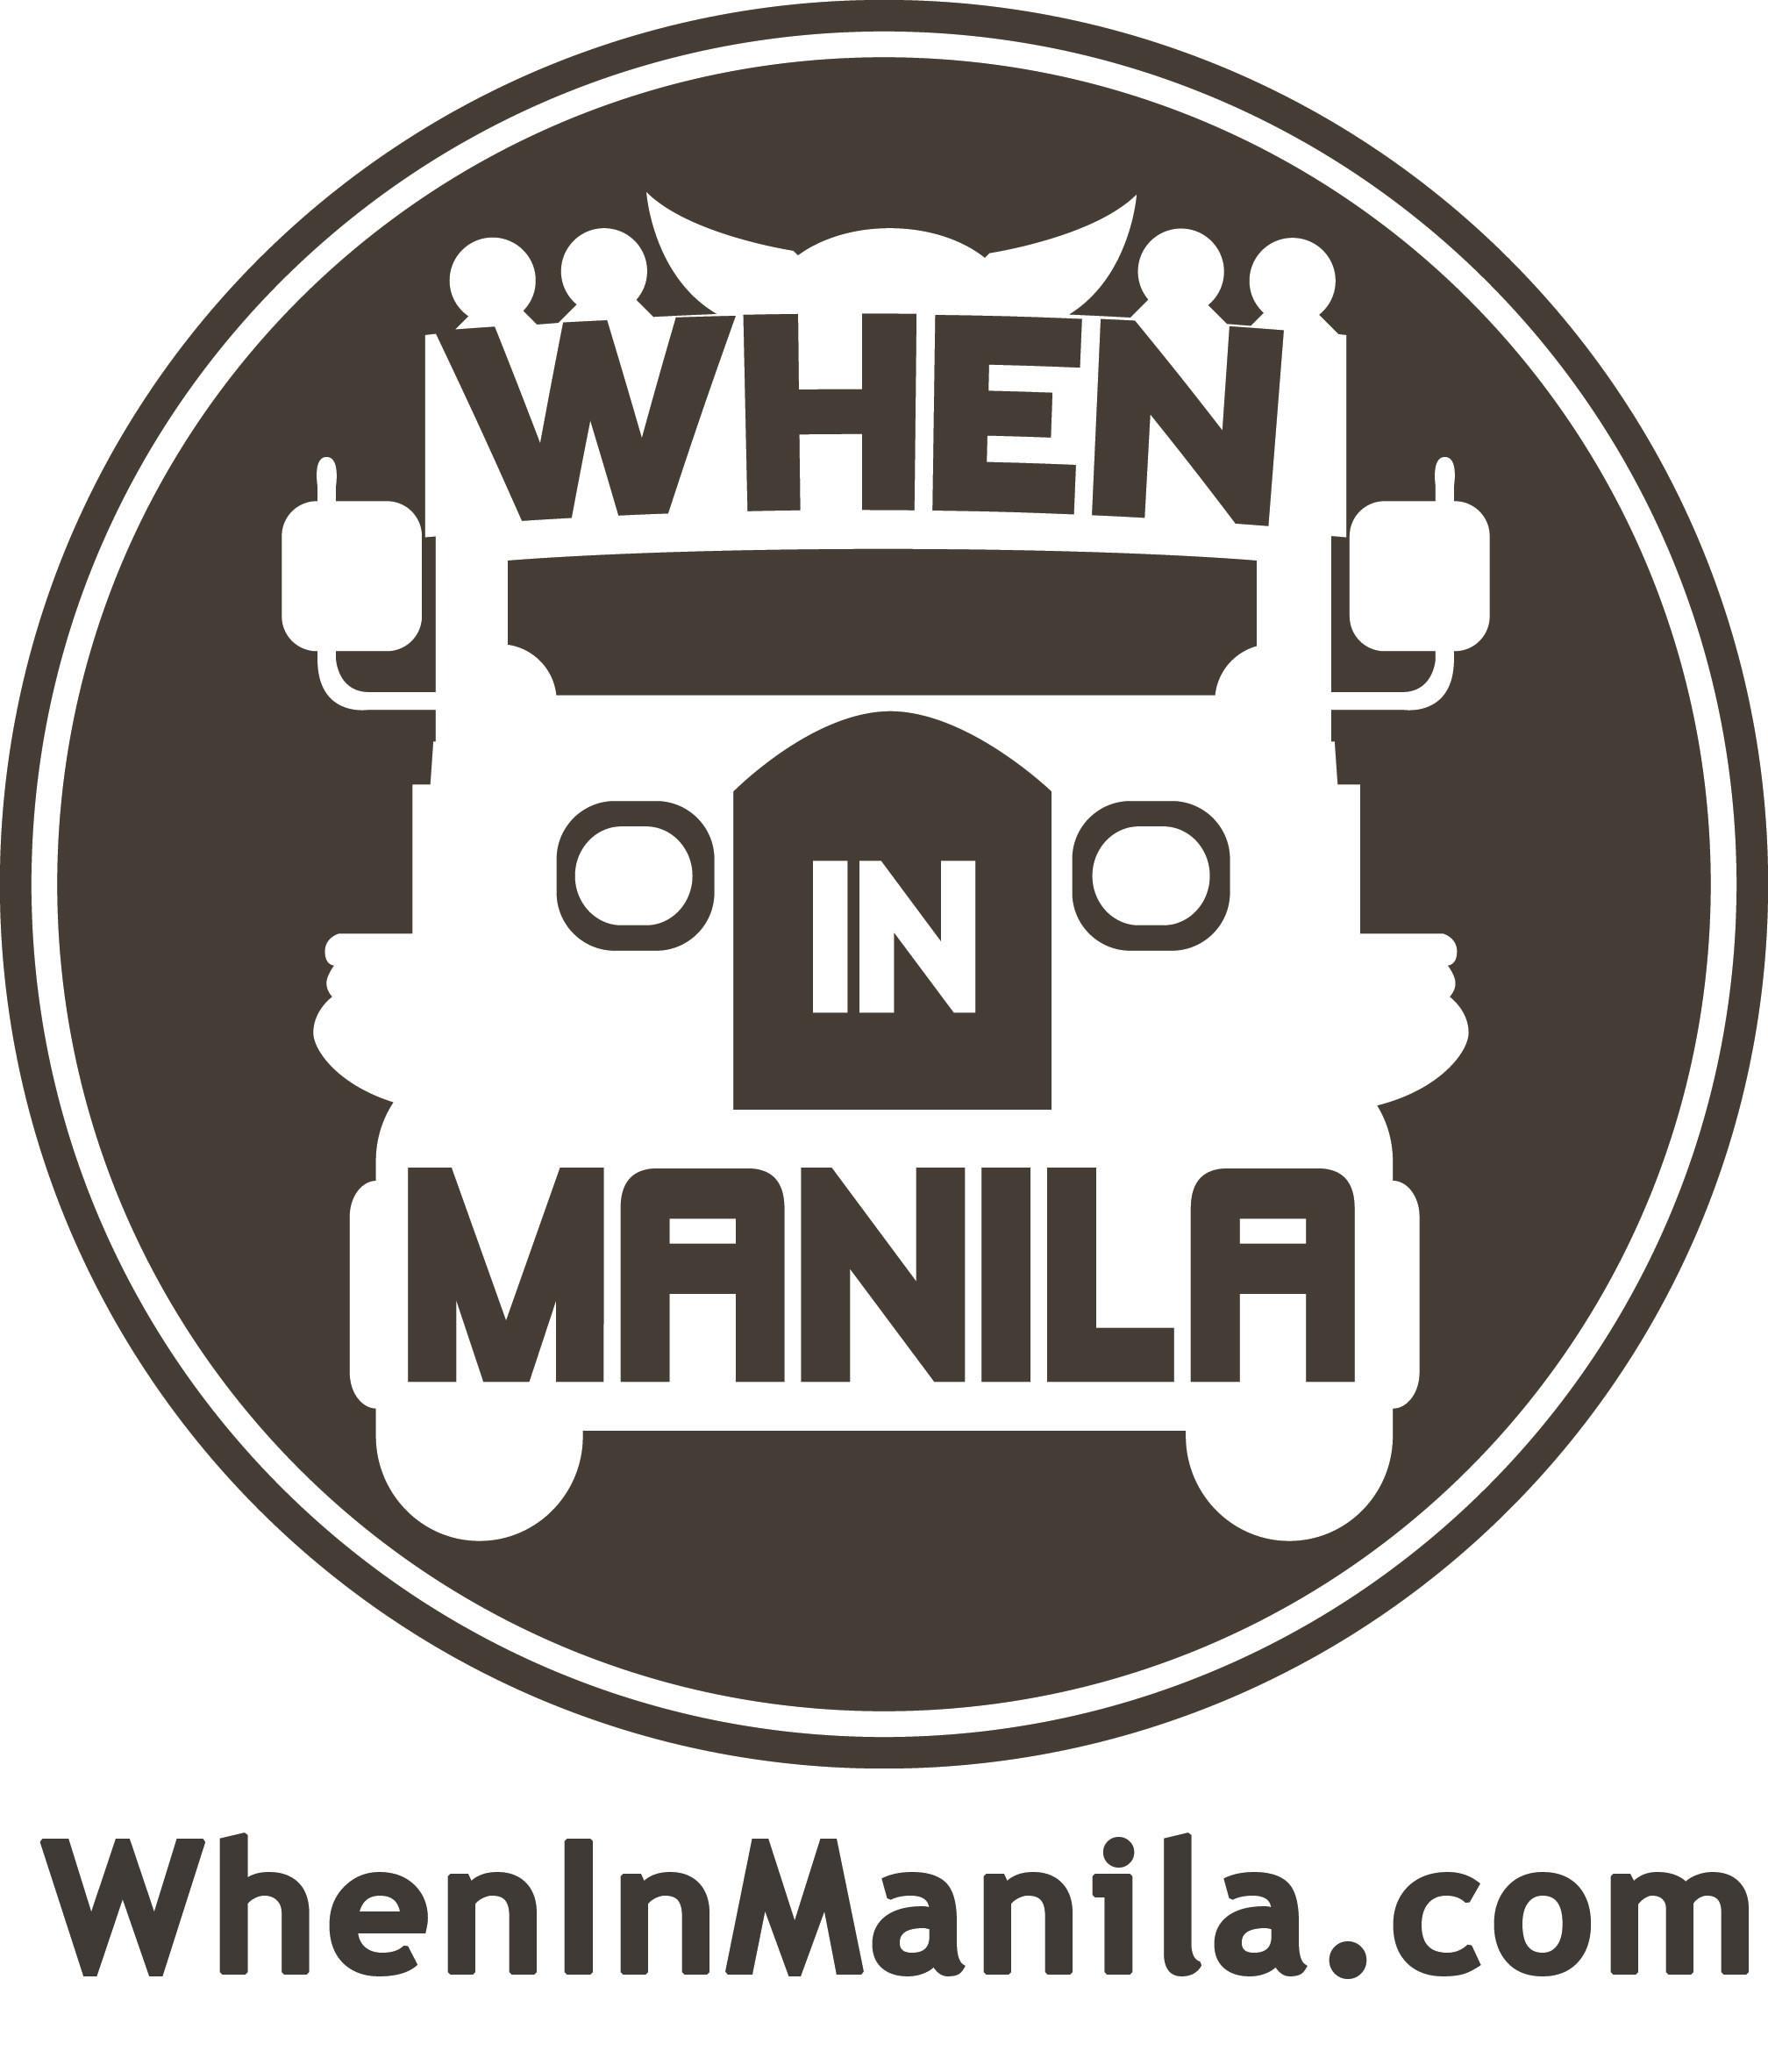 WhenInManila.com